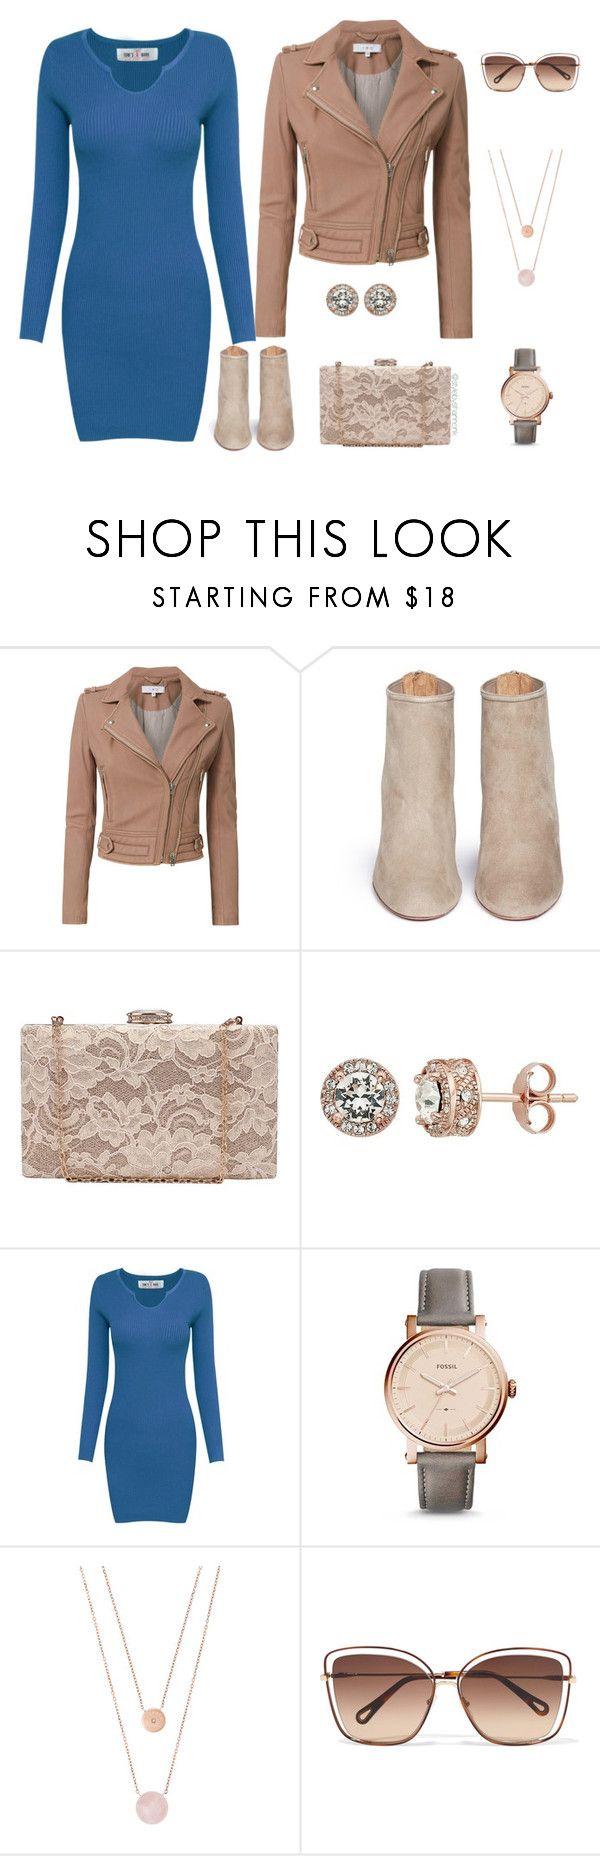 """Leather Jacket"" by stylebyshannonk on Polyvore   #polyvore #fallfashion #fallstyle #sweaterdress #minidress #croppedjacket #leatherjacket #suedeboots #suedeboot #anklebootie #ankleboot #florallace #laceclutch #bridal #doublechain #necklace #rosequartz #boyfriendwatch #womenswatch #diamondearrings #swarovskicrystal #cateye #sunglasses"